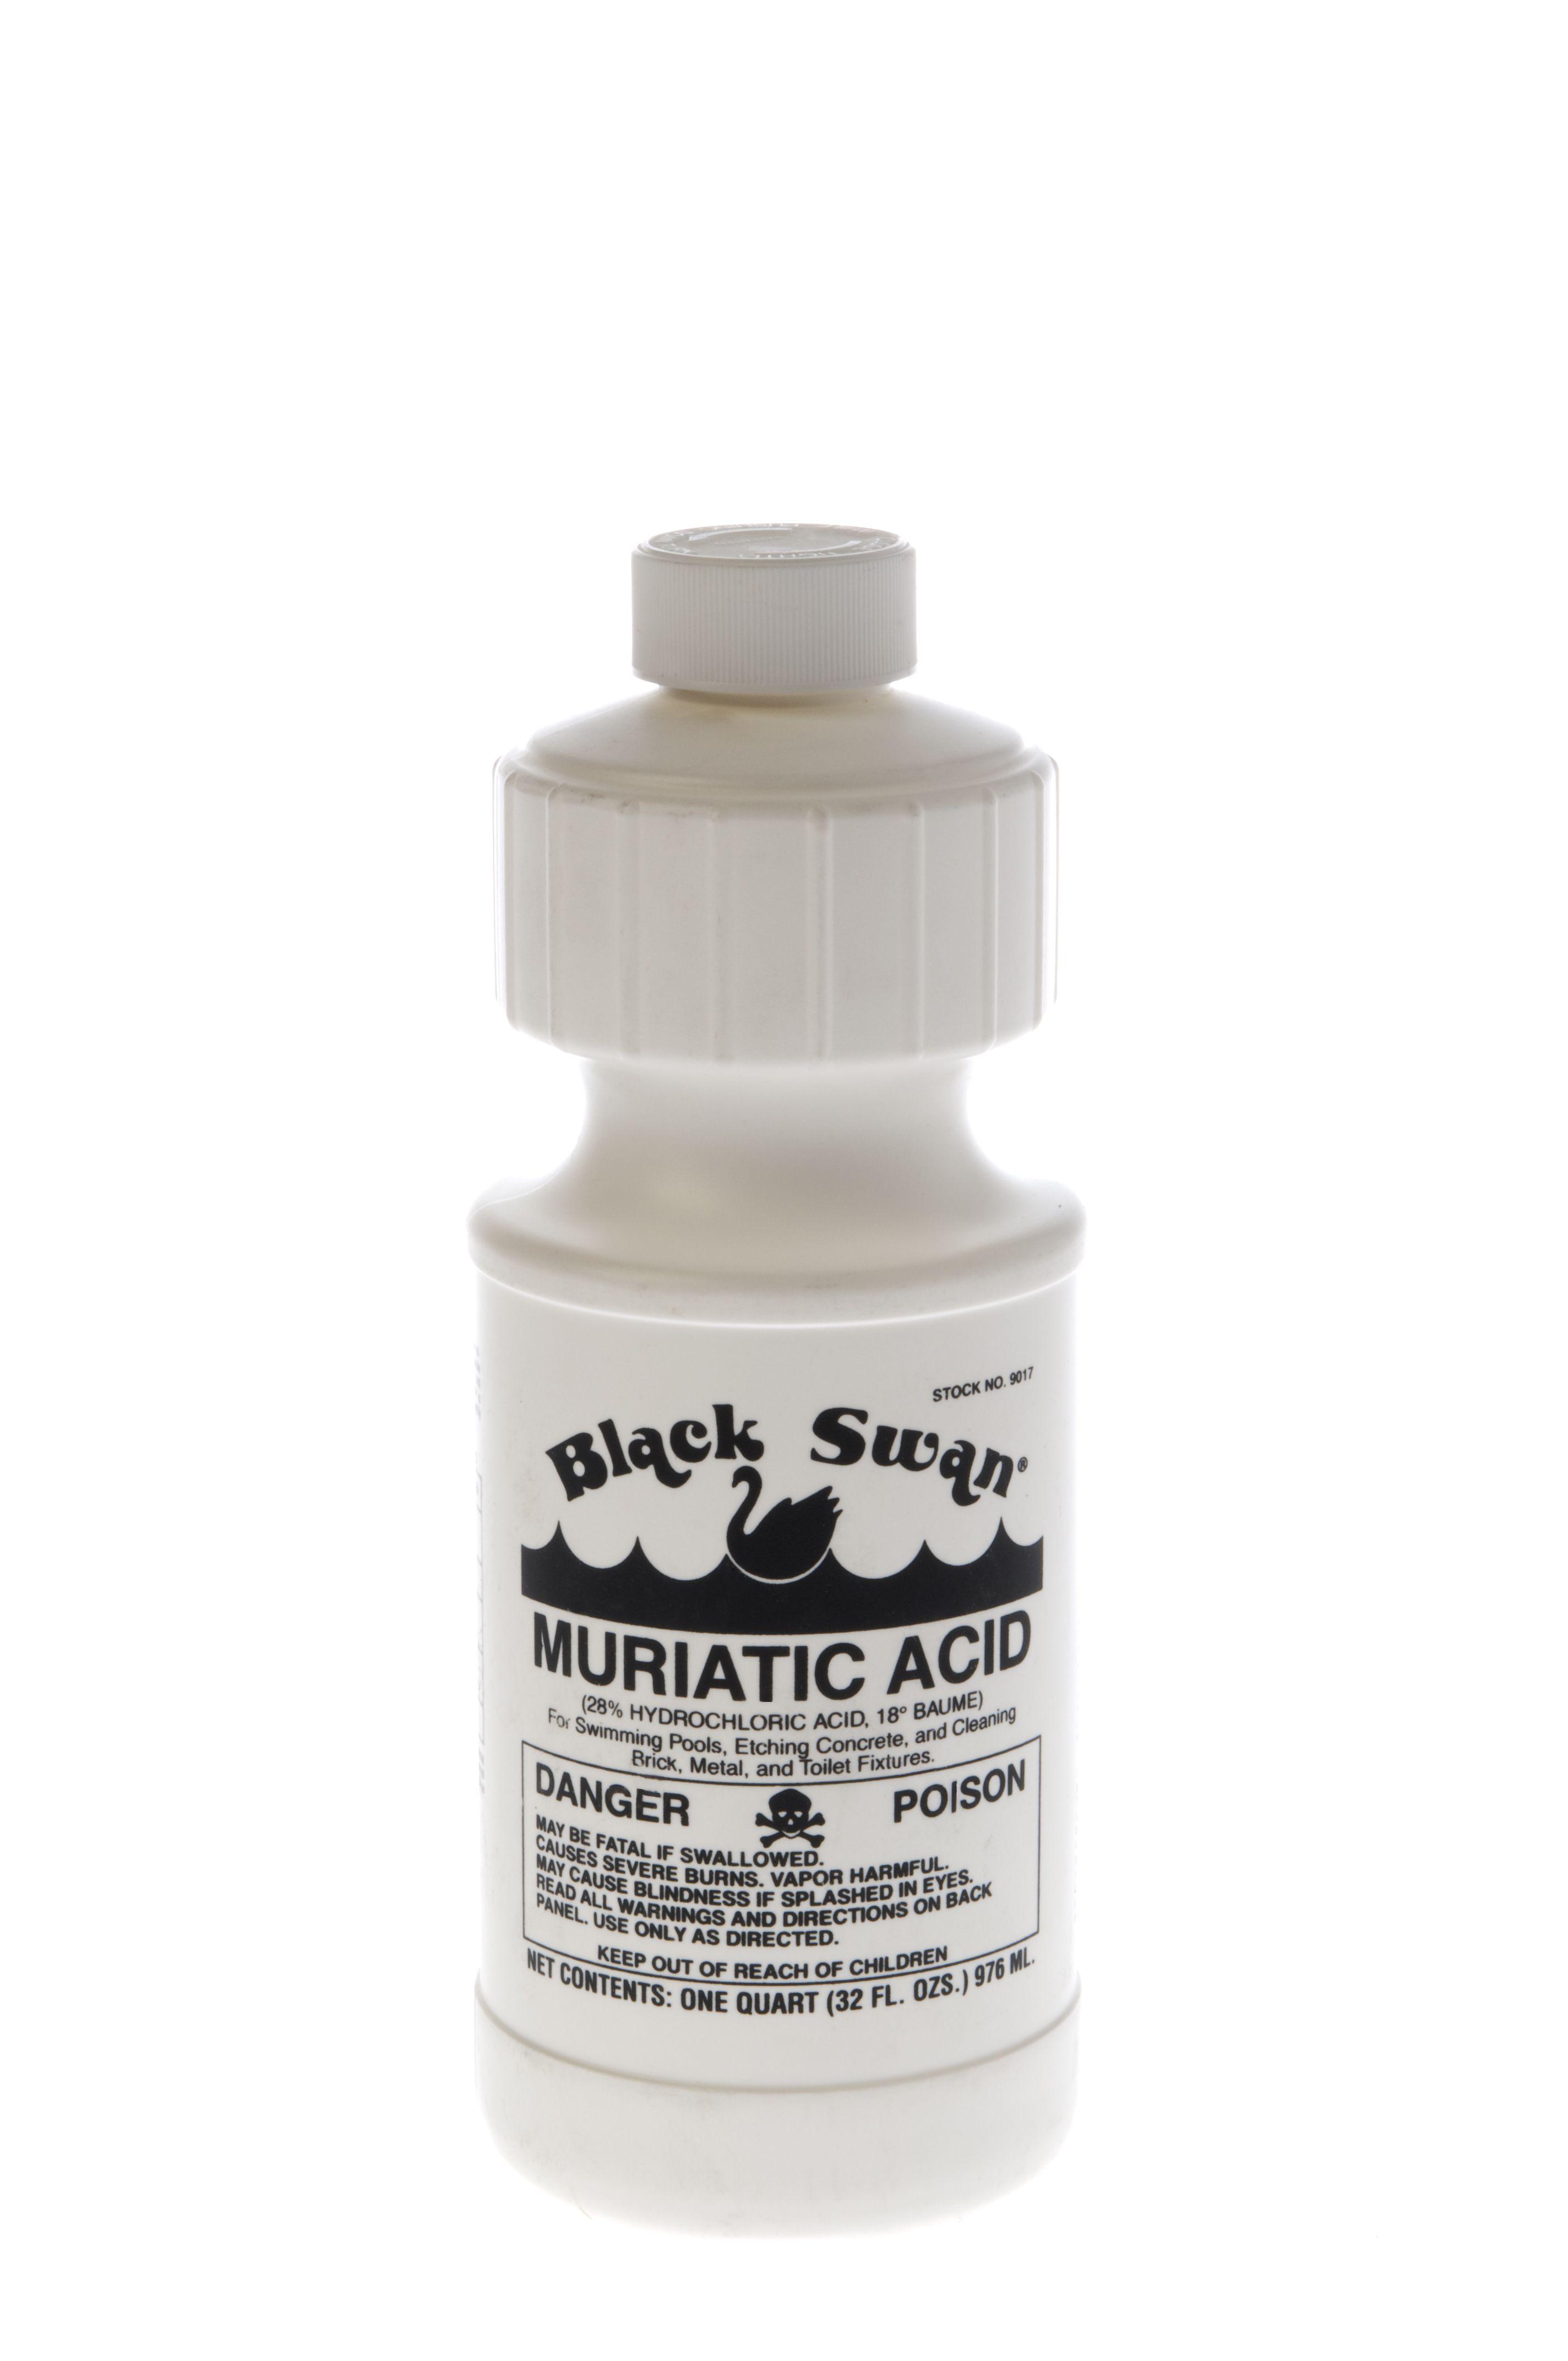 Black Swan S 18 176 Muriatic Acid Is 28 Hydrochloric Acid